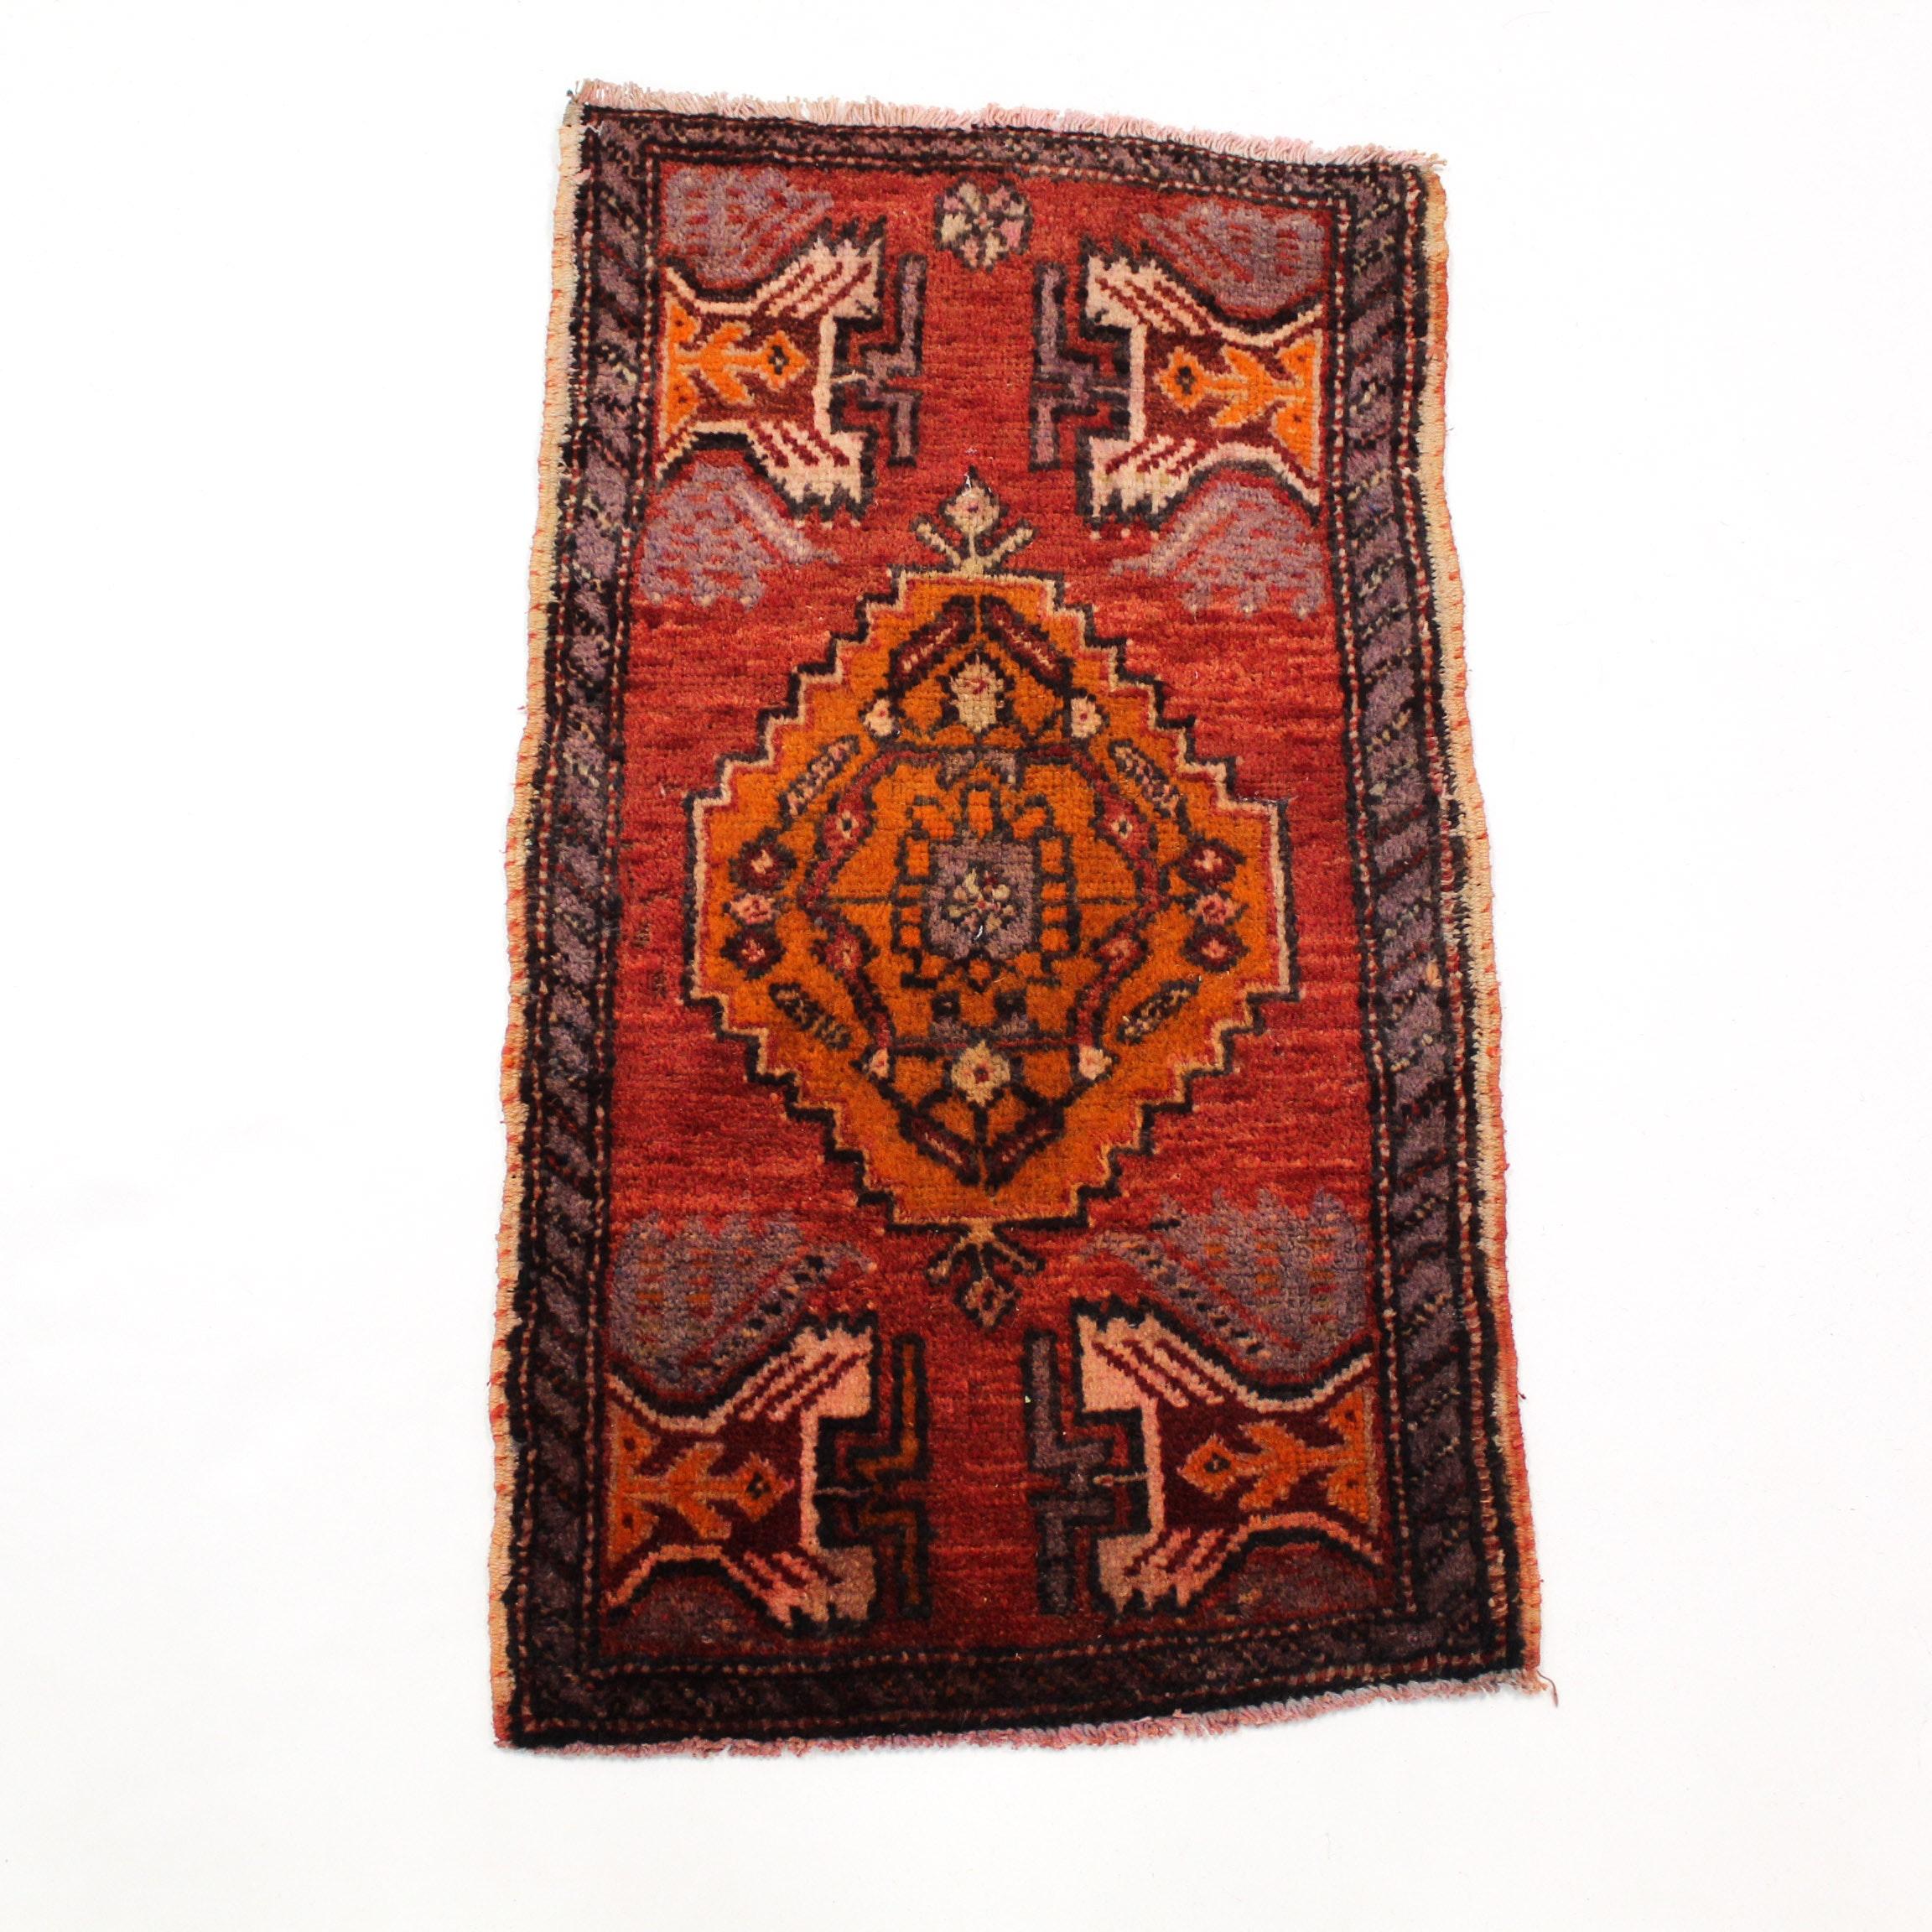 Hand-Knotted Turkish Oushak Village Rug, circa 1960